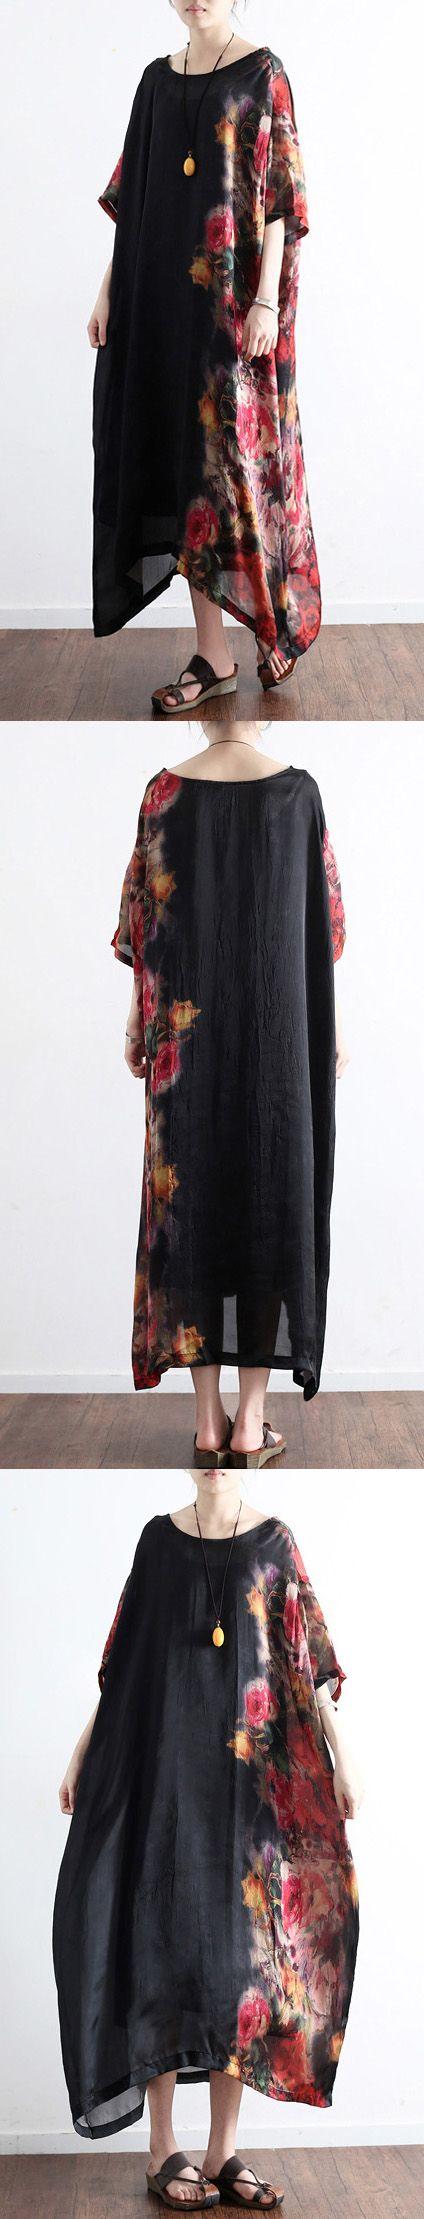 2017 black prints silk dresses plus size sundress patchwork short sleeve maxi